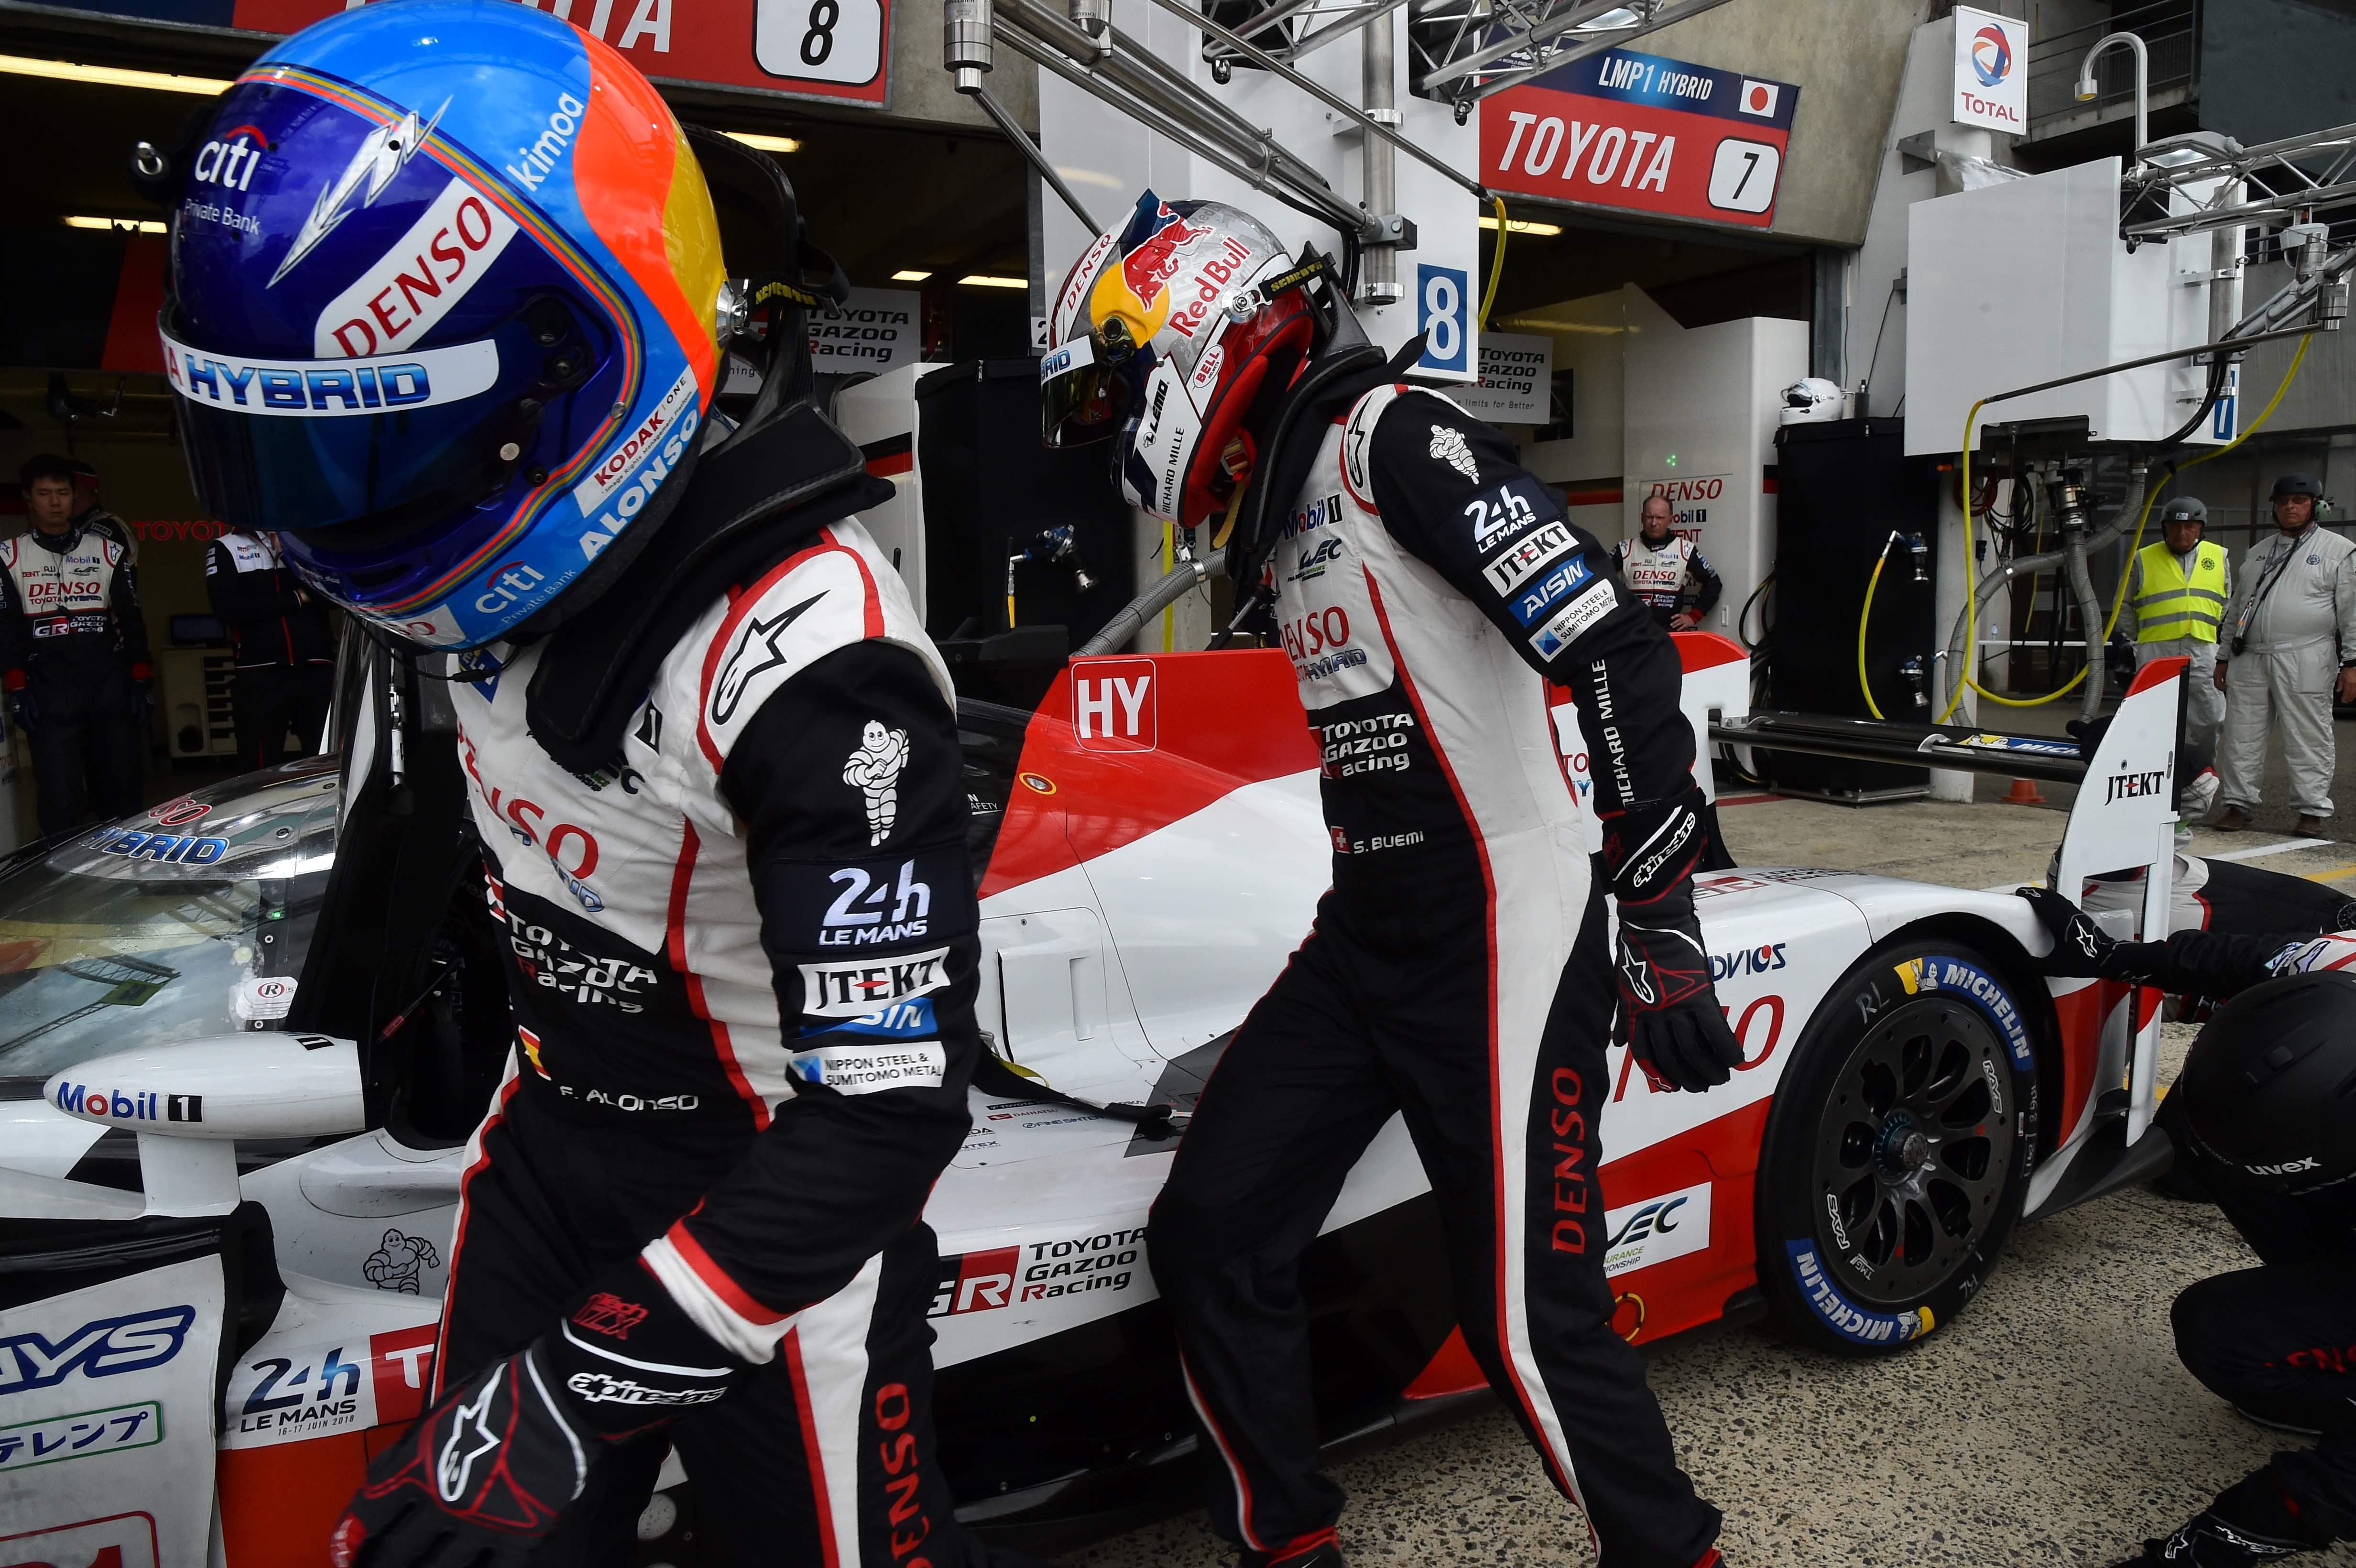 Fernando Alonso drives for the ToyotaWorld Endurance Championship team alongside Sebastian Buemi